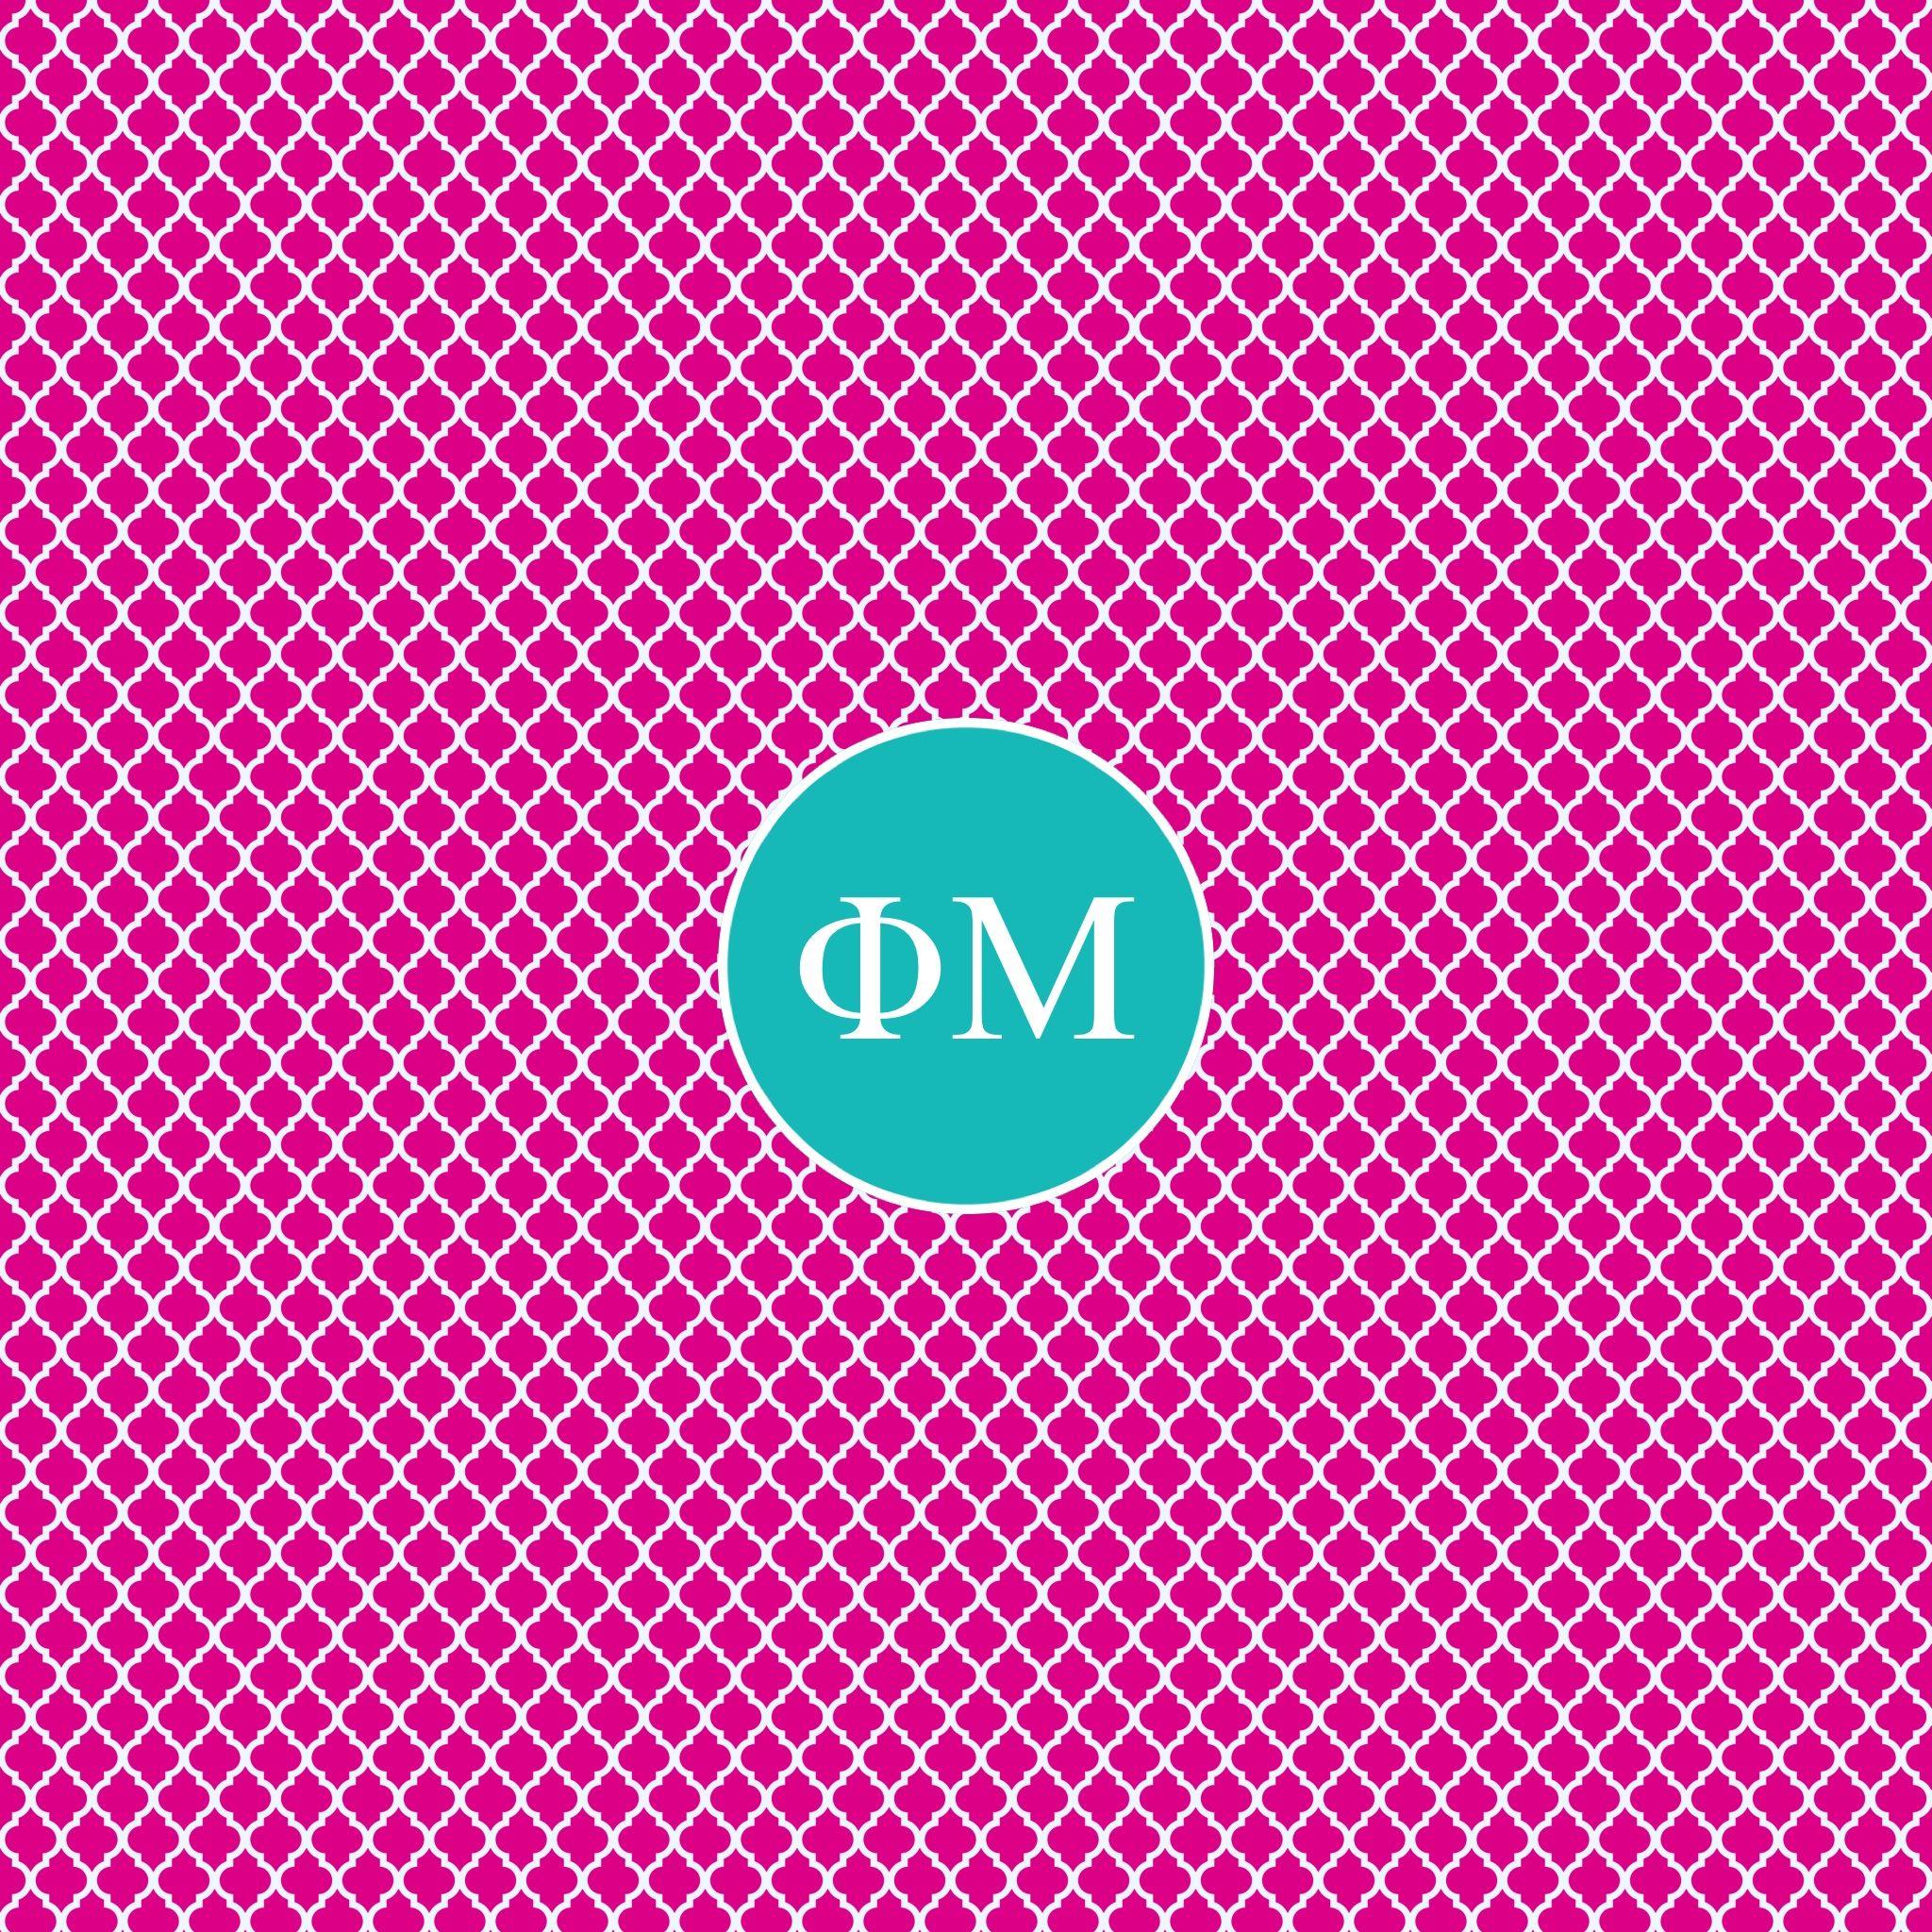 Phi Mu Monogram! | Monogram Madness | Pinterest | Monograms